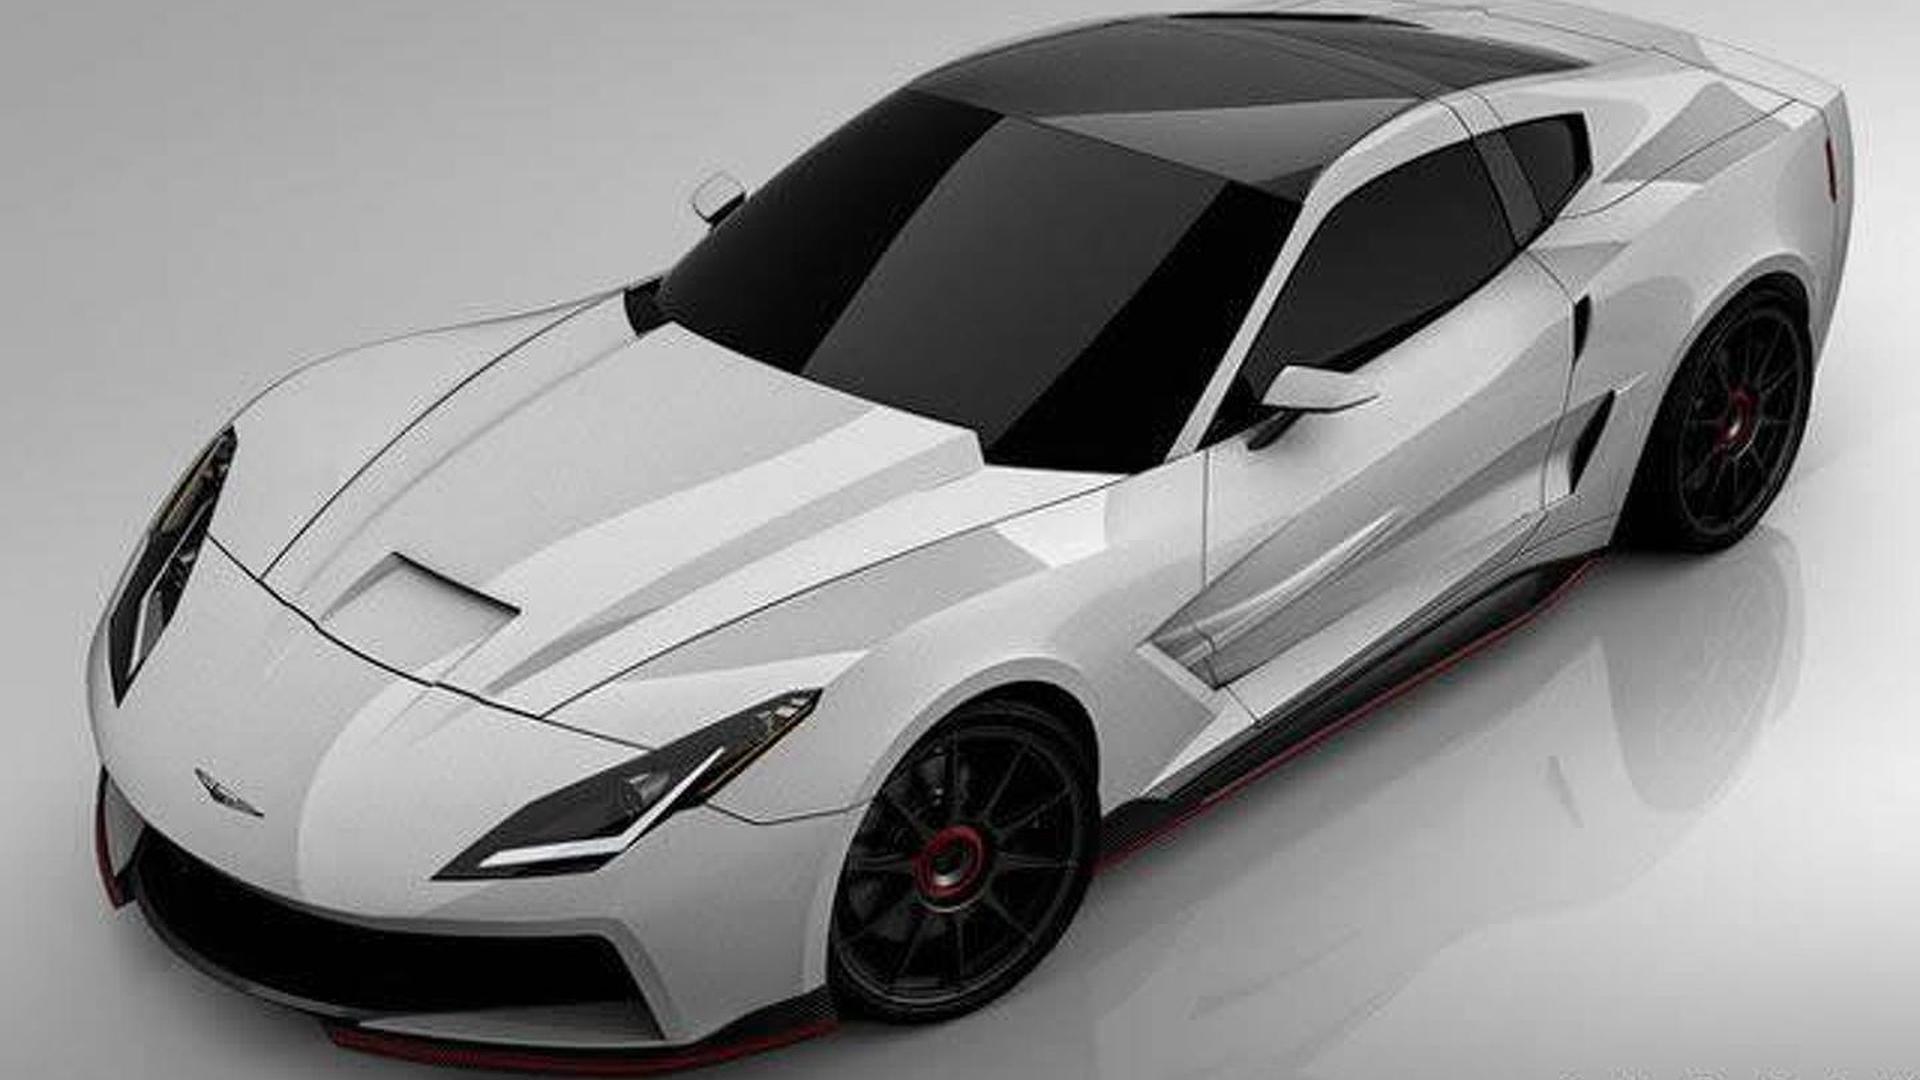 Supervettes releases aero kit for Corvette C6